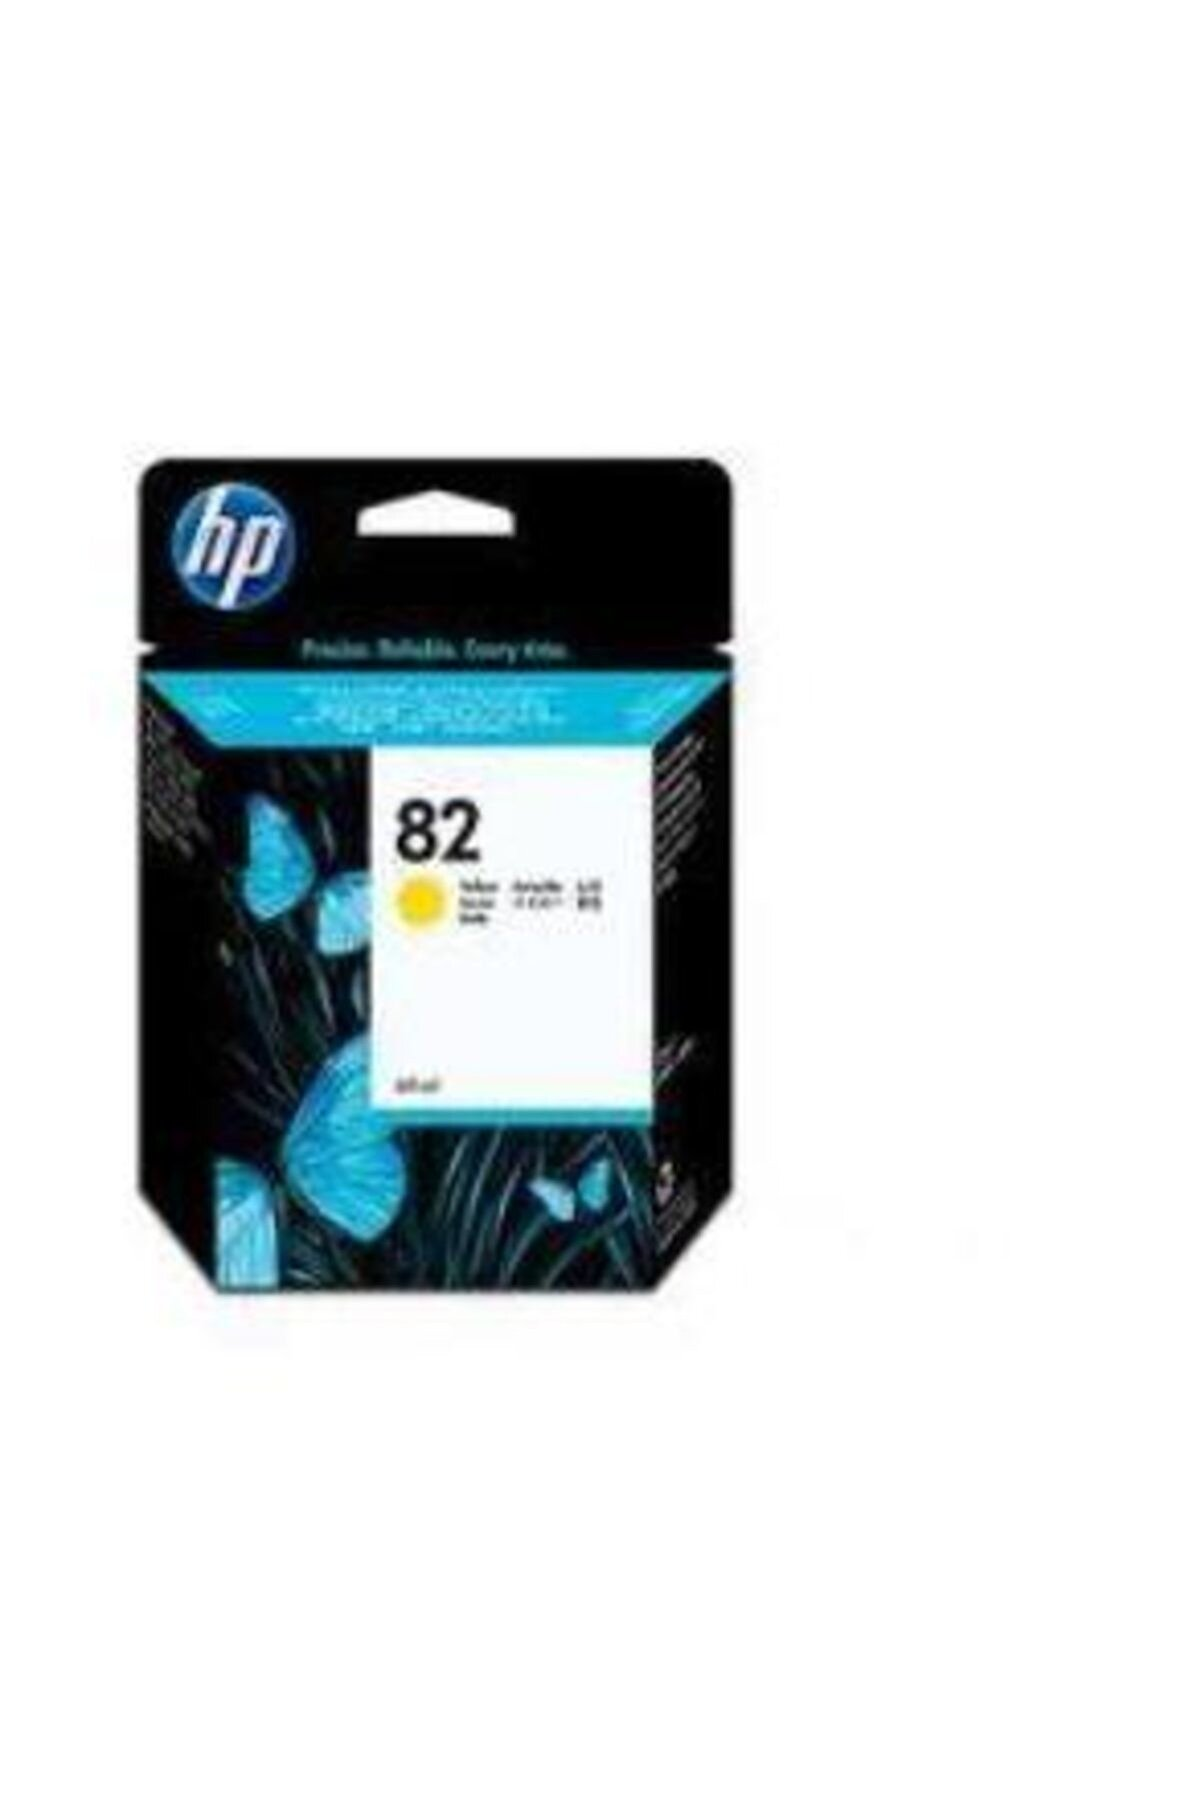 HP C4913A DesignJet 500/800 Serisi Sarı Kartuş No:82